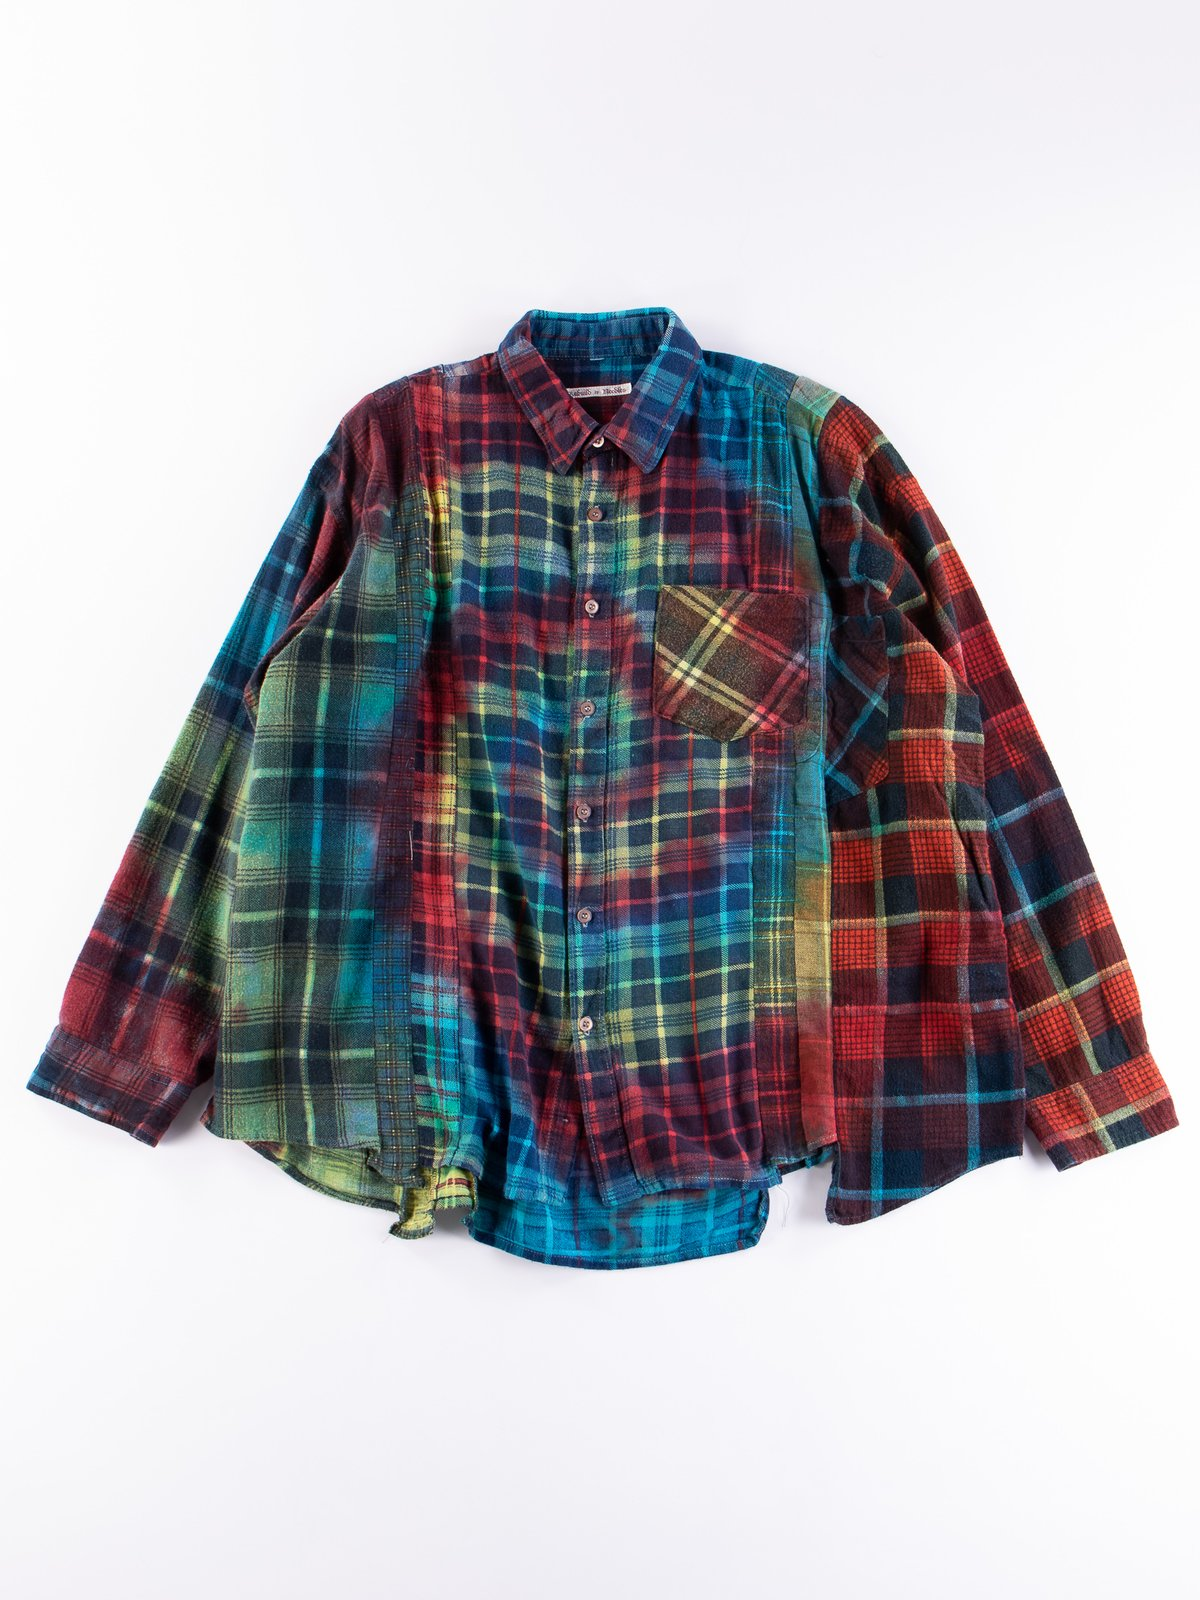 Tie Dye Assorted 7 Cuts Rebuild Shirt - Image 5